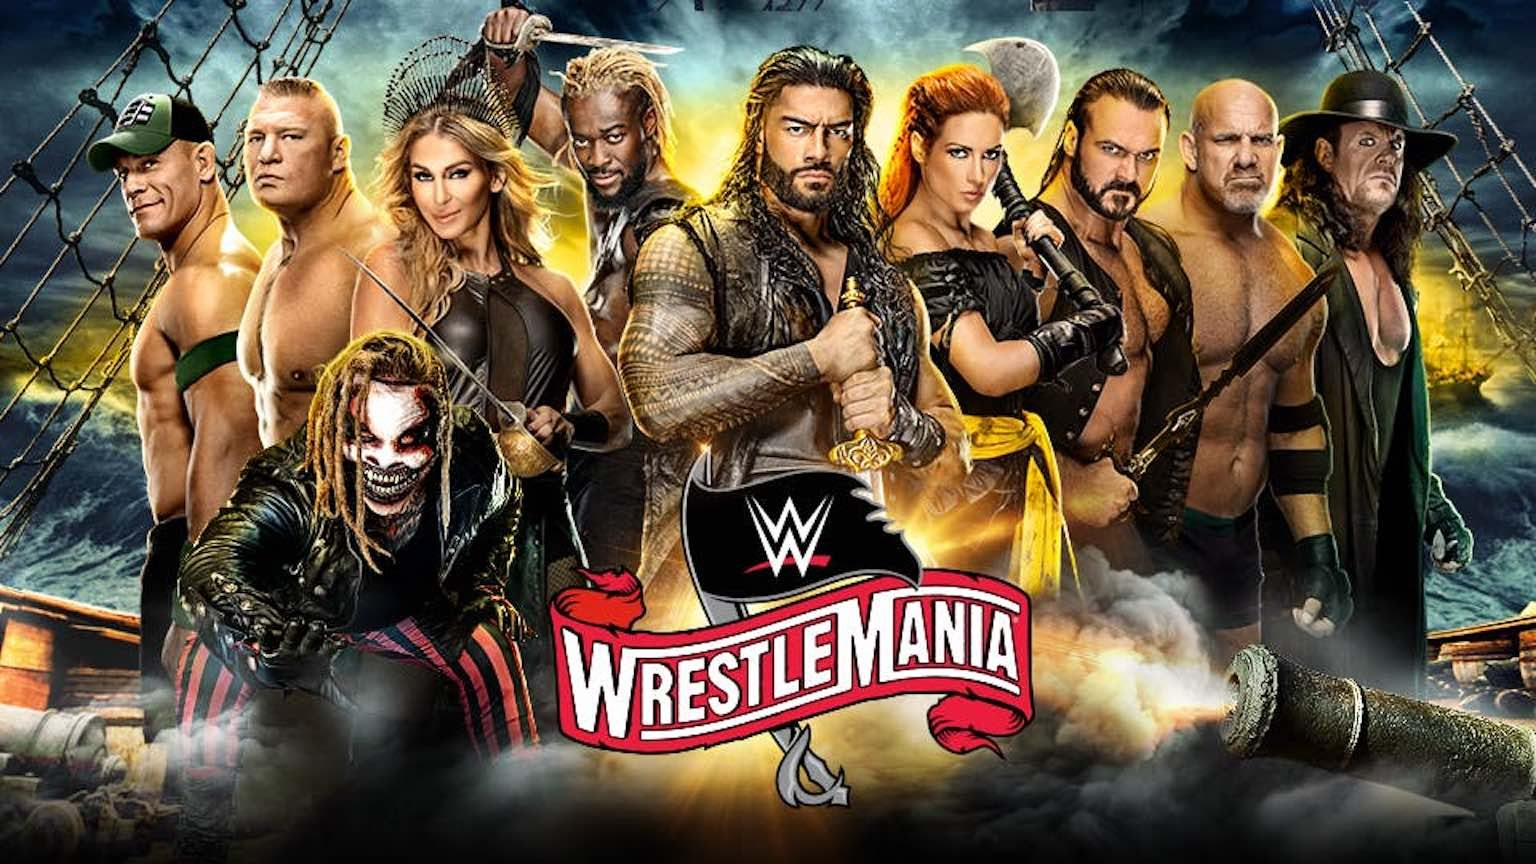 Wrestlemania 36 poster